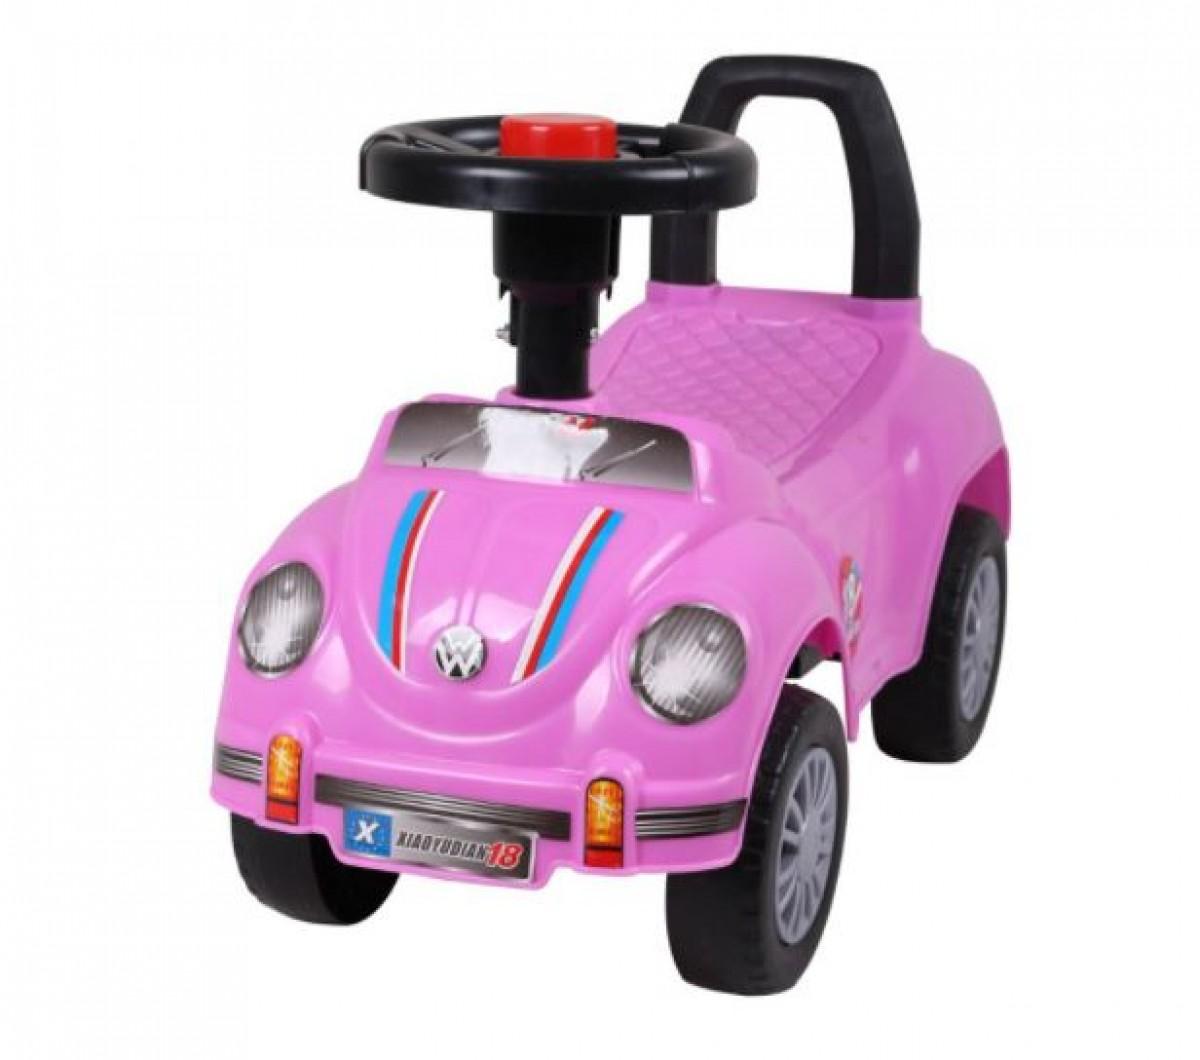 Toy Car - Kico Baby Center